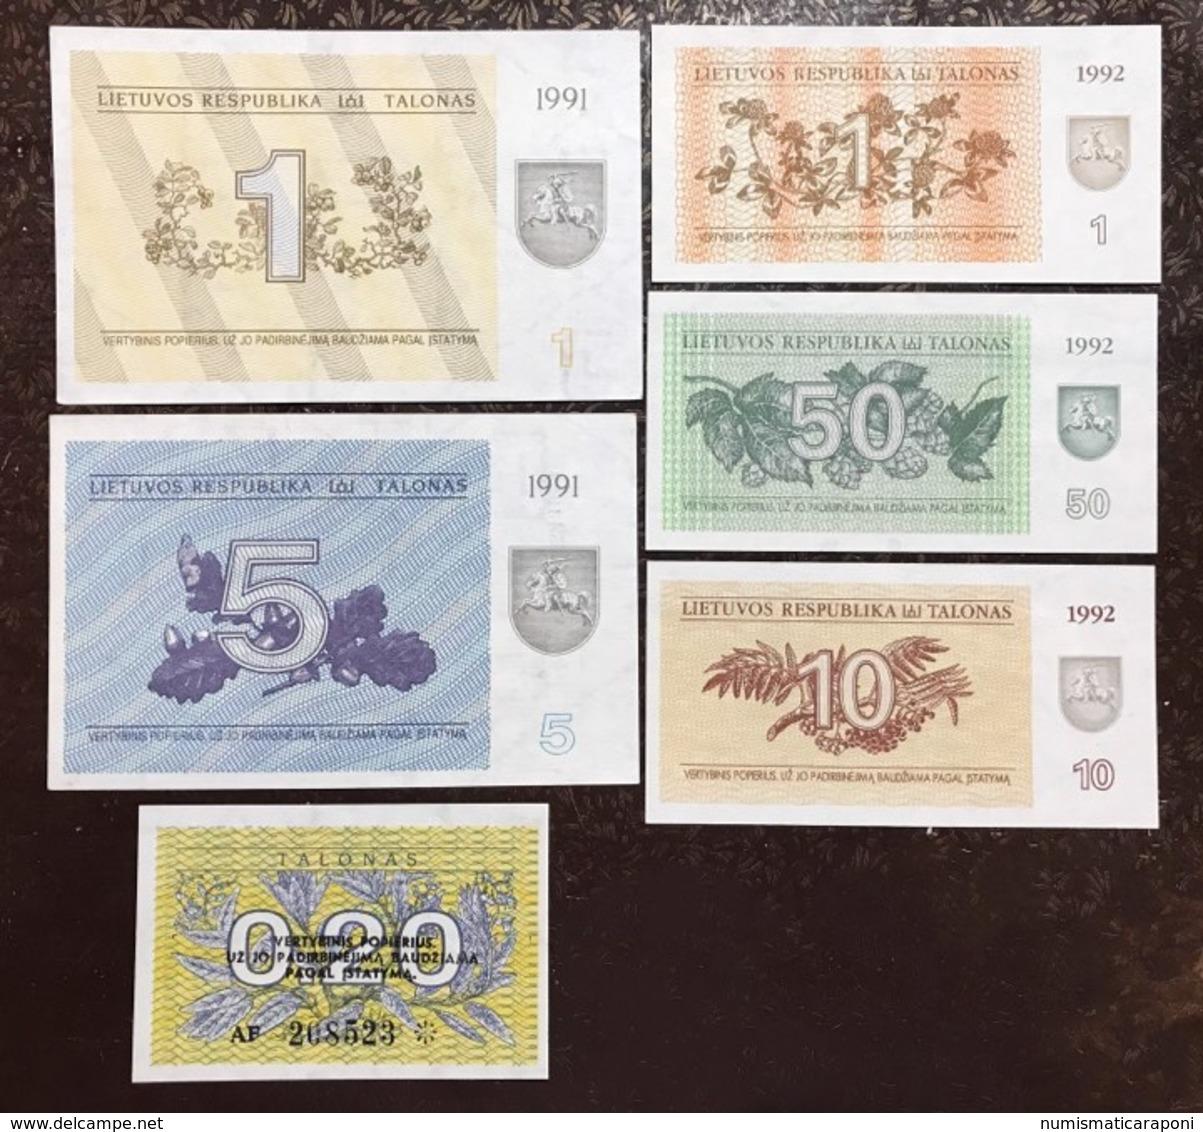 Lituania Lietuva 1991 1 + 5 + 1992 0,20 + 1 + 2 + 10 + 50 Talonas  Lotto 2302 - Latvia